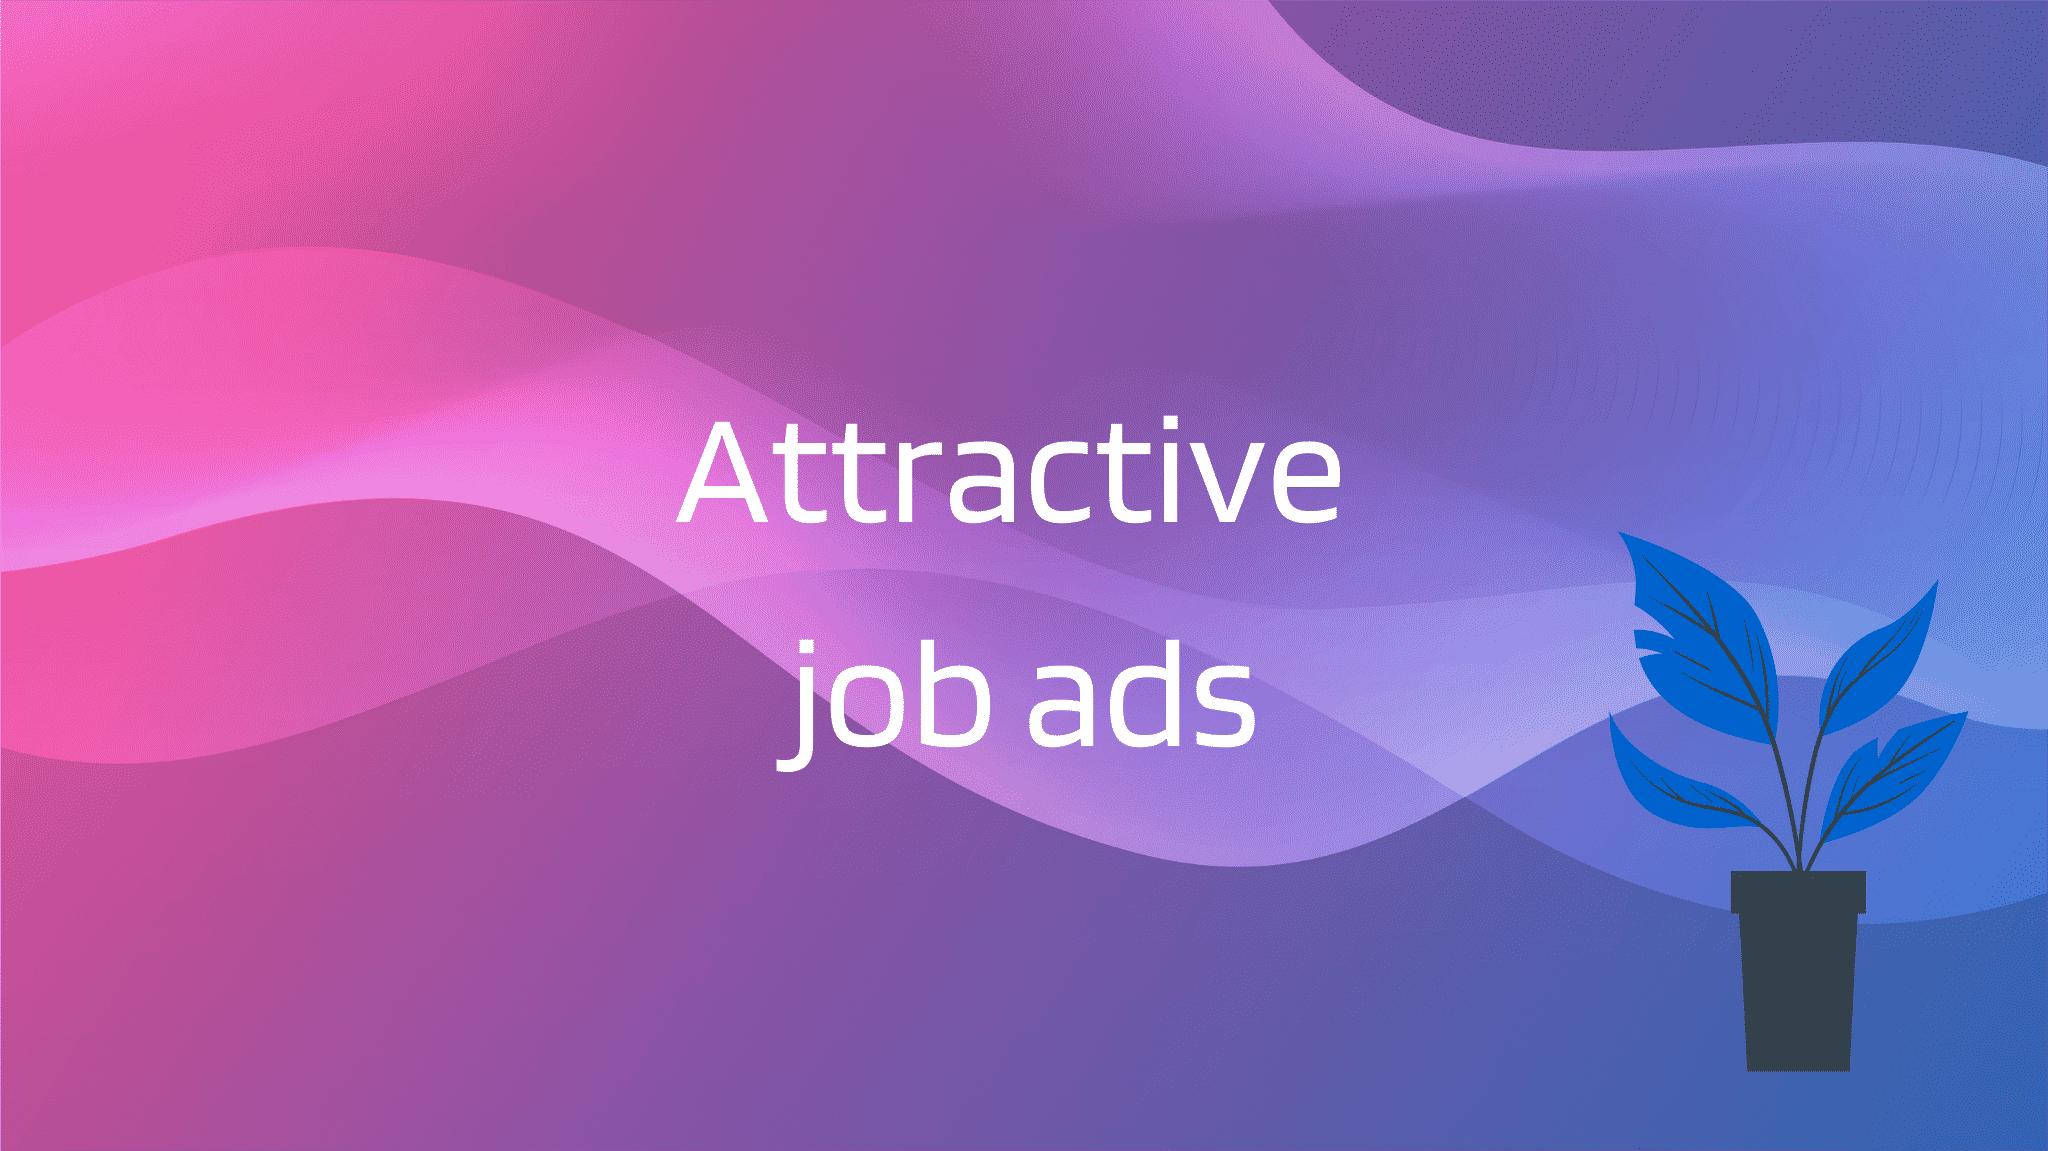 Attractive job ads